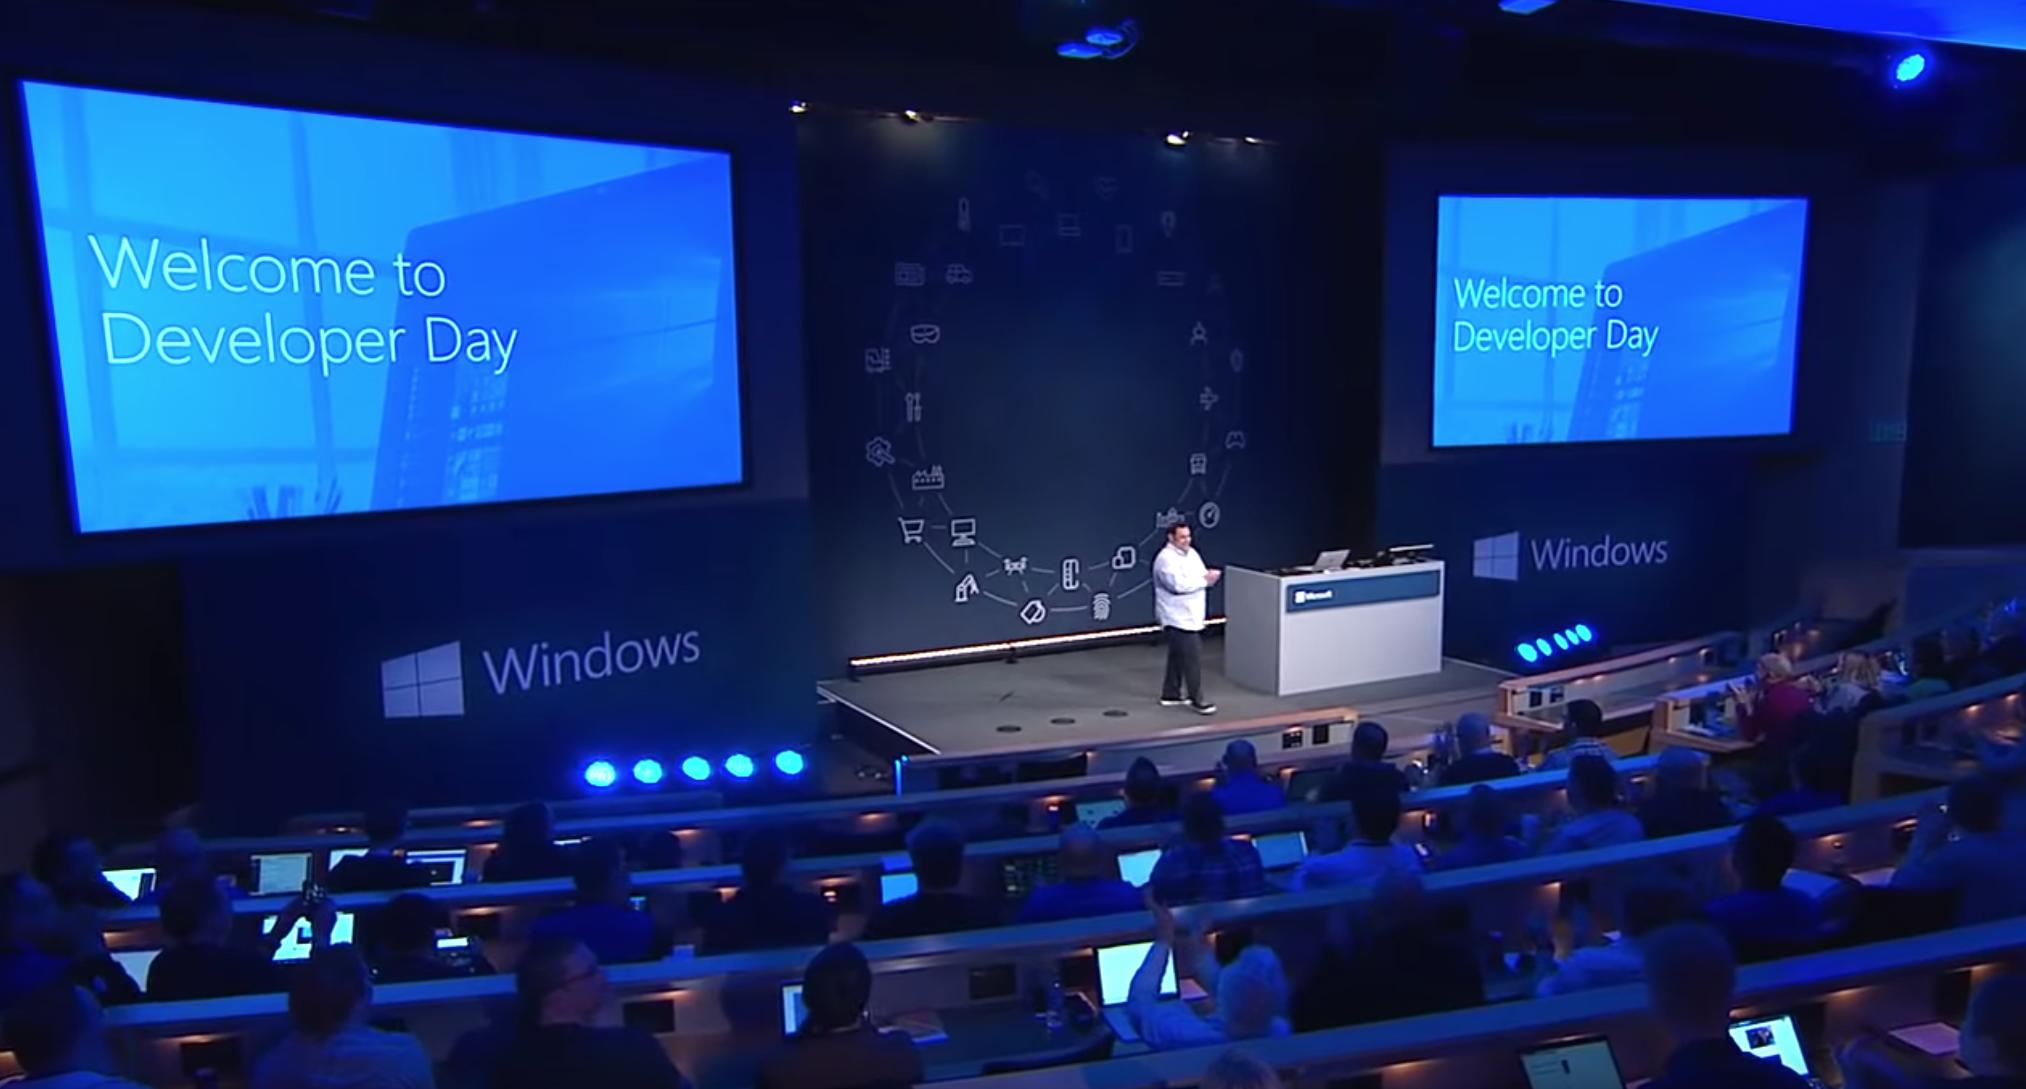 Keynote-Video: Windows Developer Day 2018